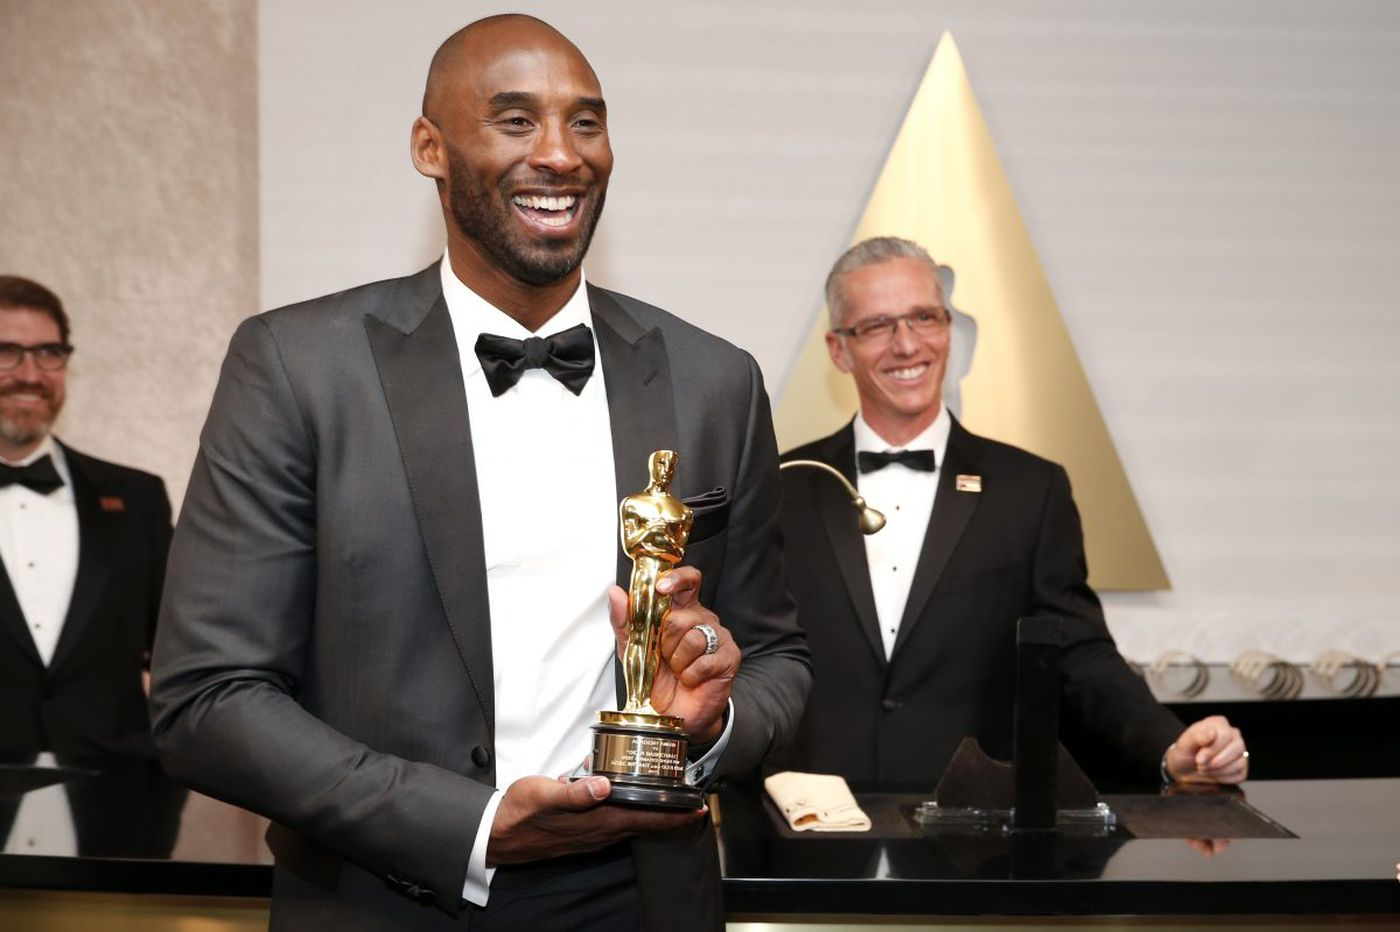 Kobe Bryant talks Oscar win on 'Jimmy Kimmel'